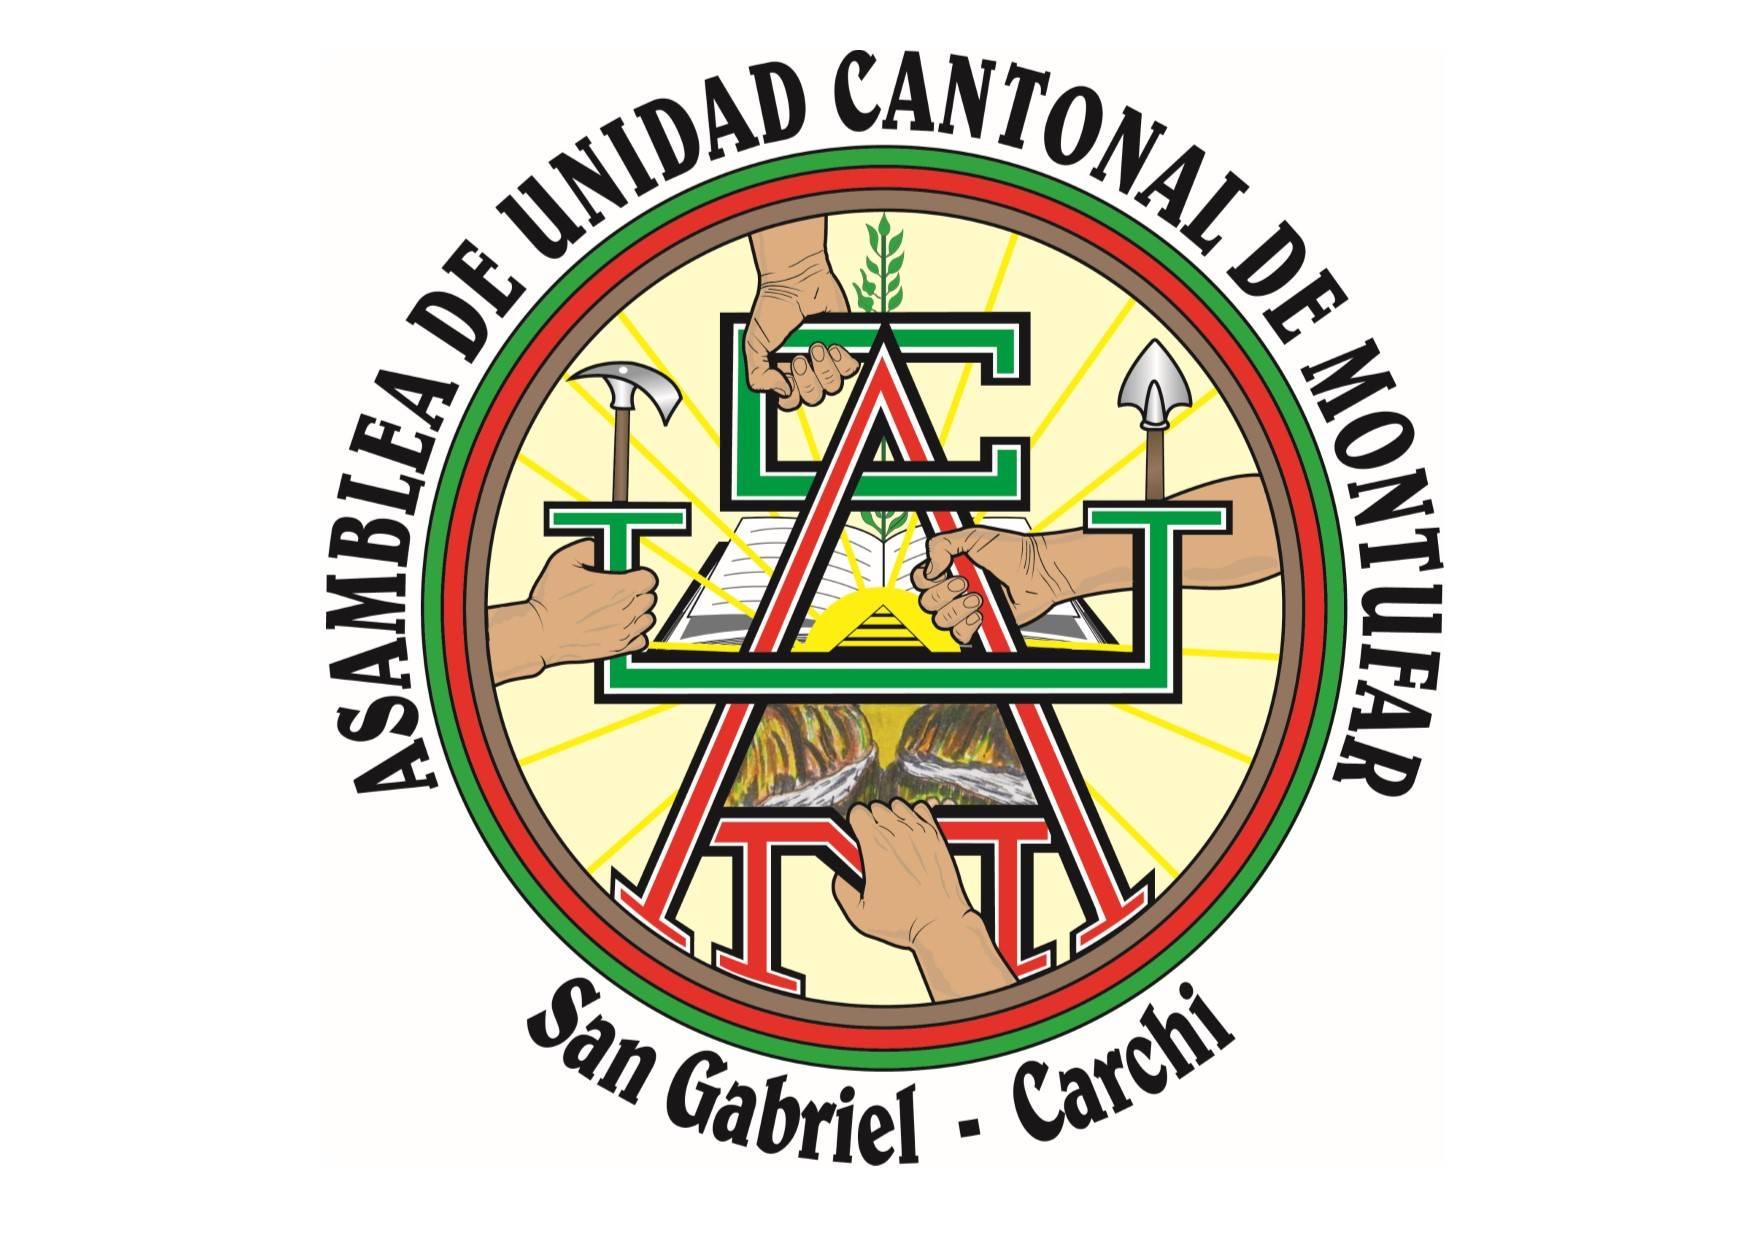 Logo de ASAMBLEA DE UNIDAD CANTONAL DE MONTÚFAR